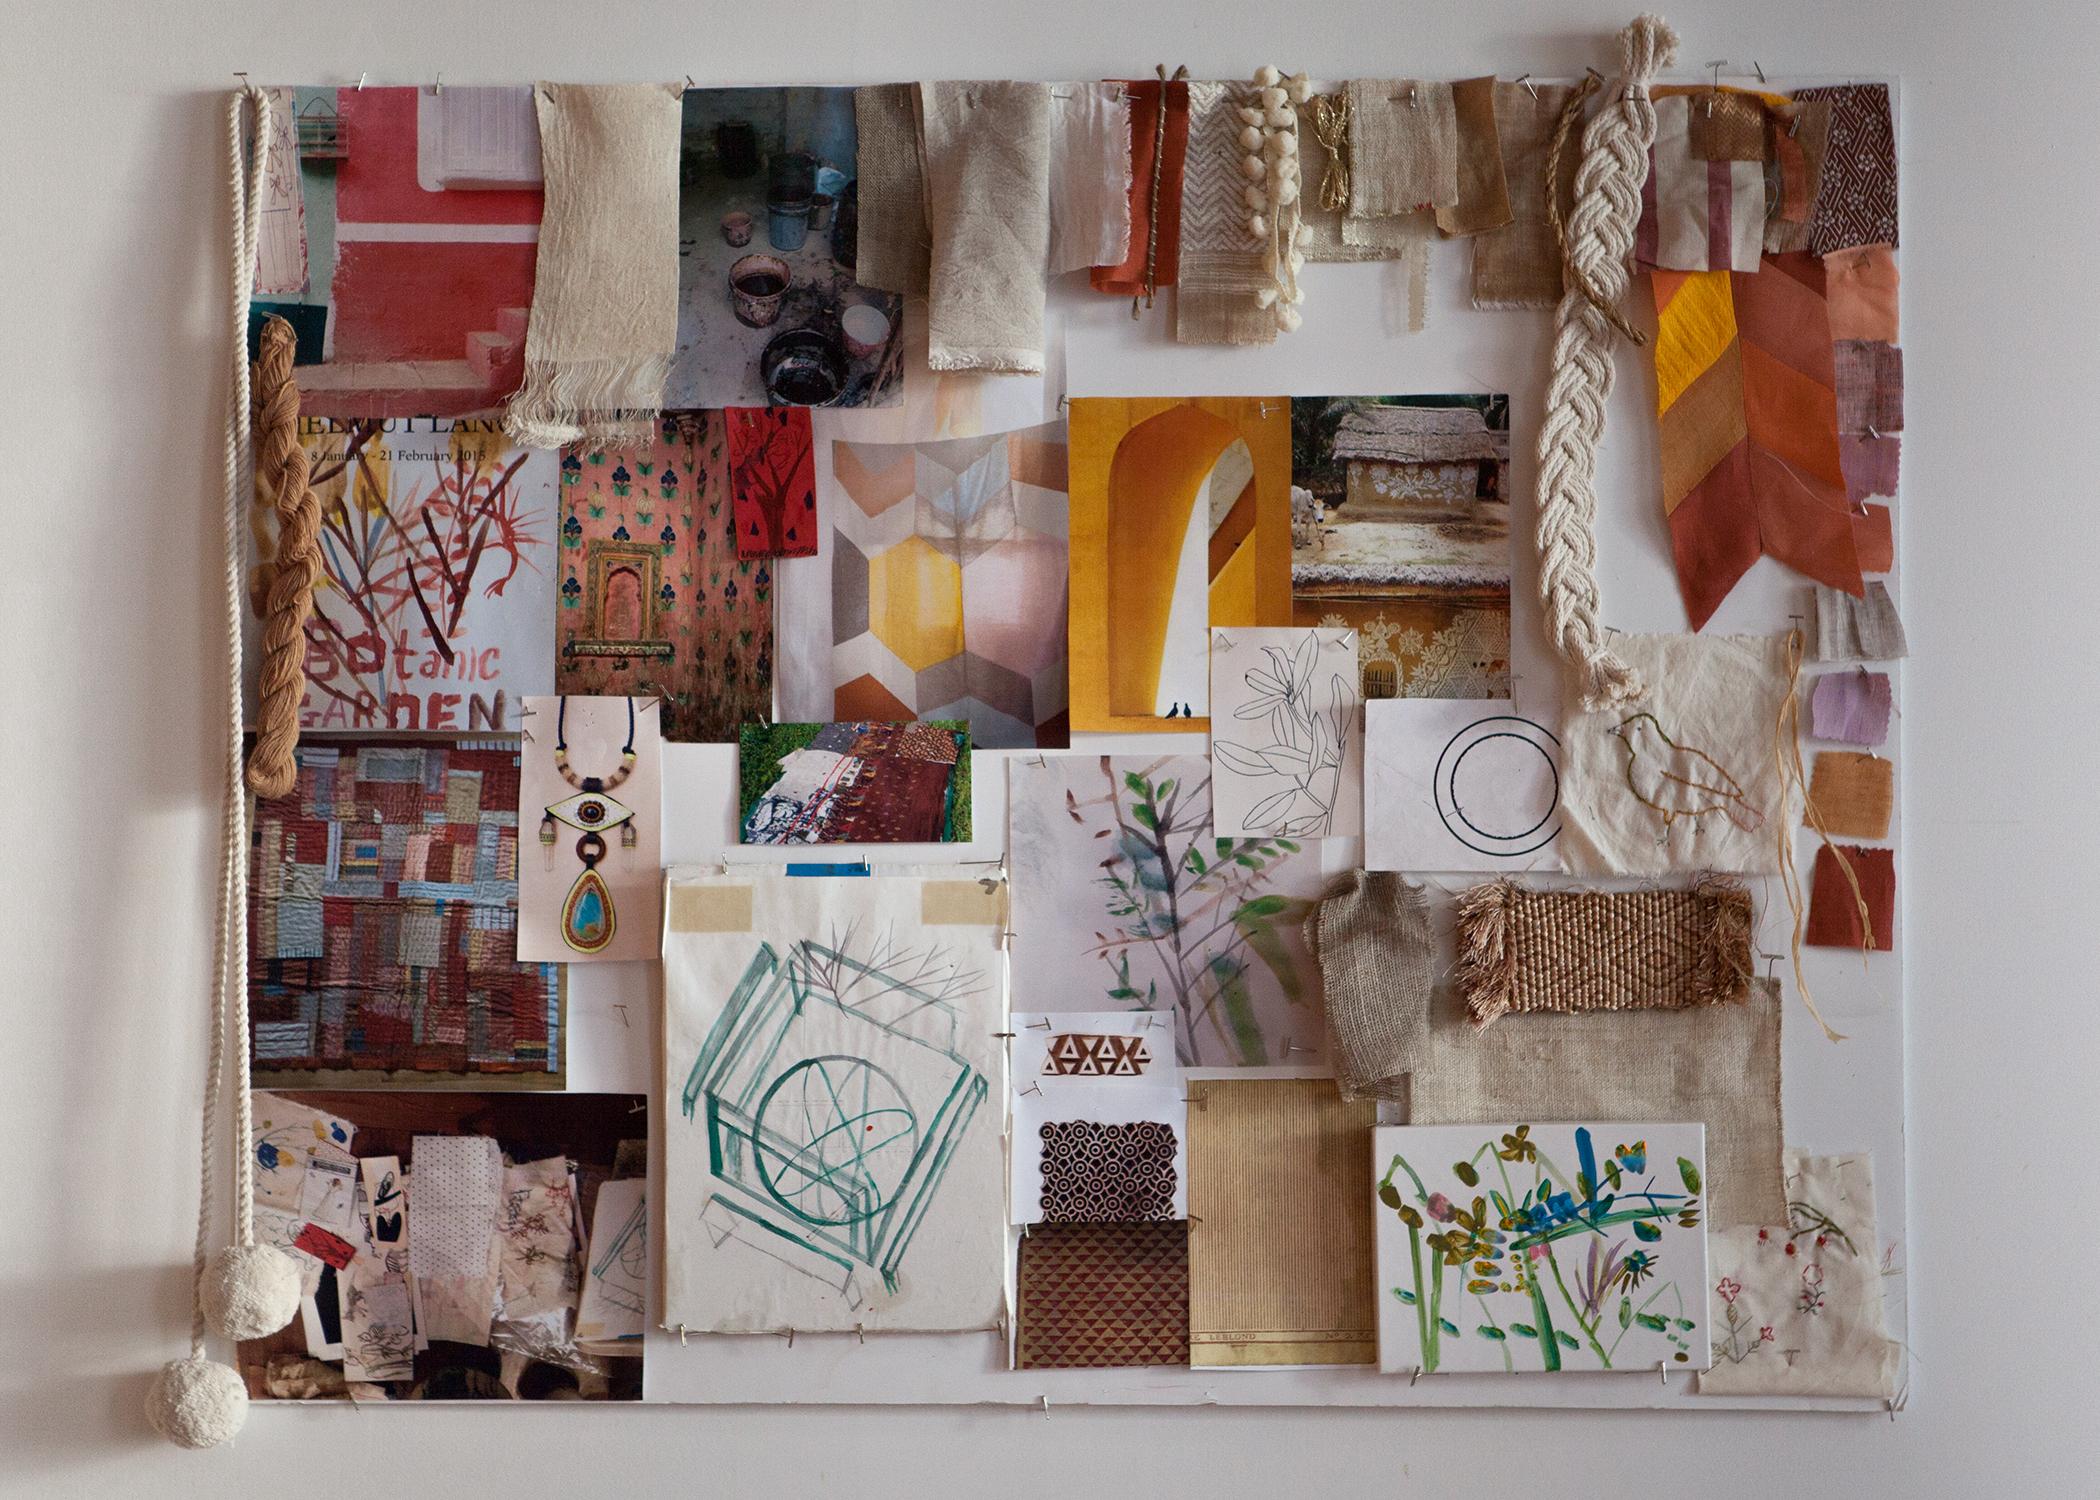 Thompson Street Studio by Robin Stein